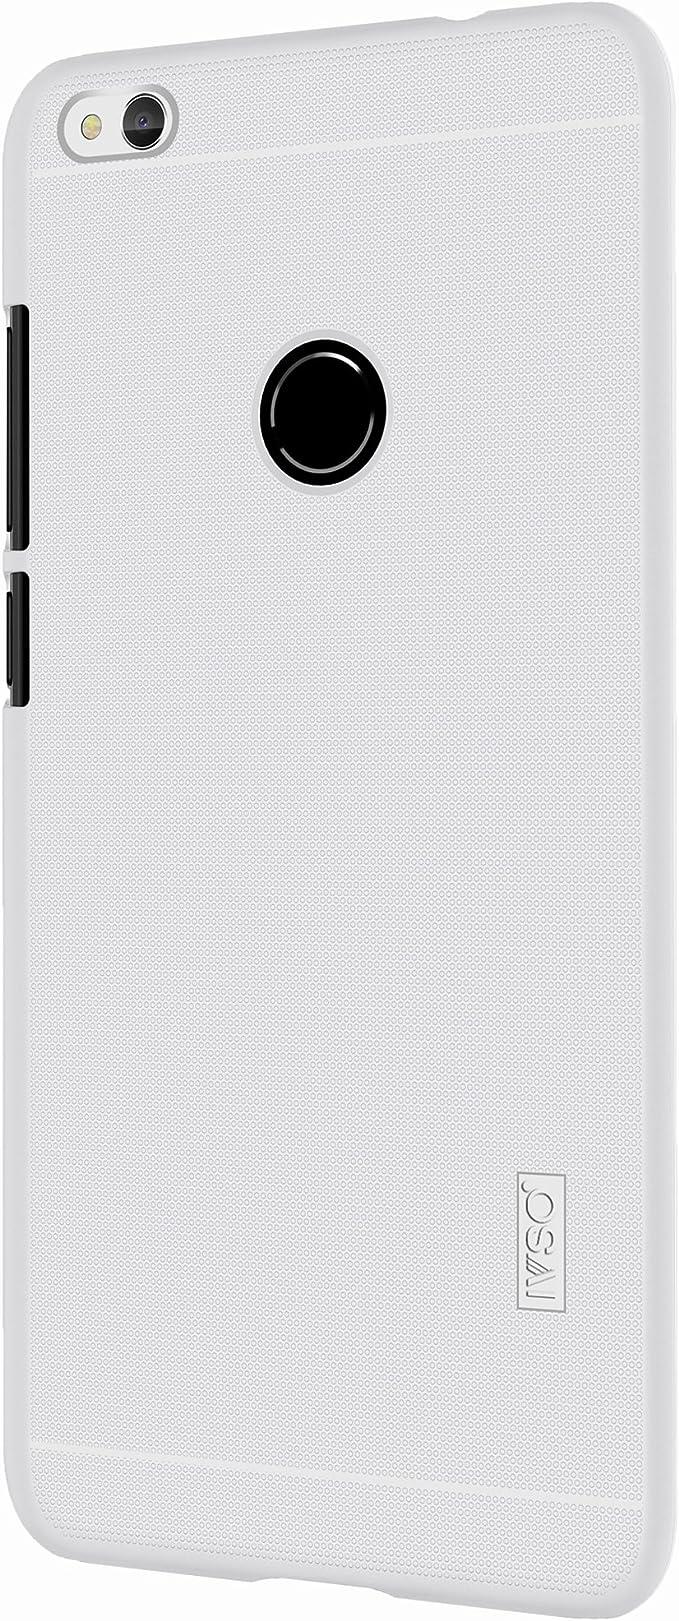 IVSO Huawei P9 Lite Funda Ultra-Slim Concha Dura Caso Cubierta ...